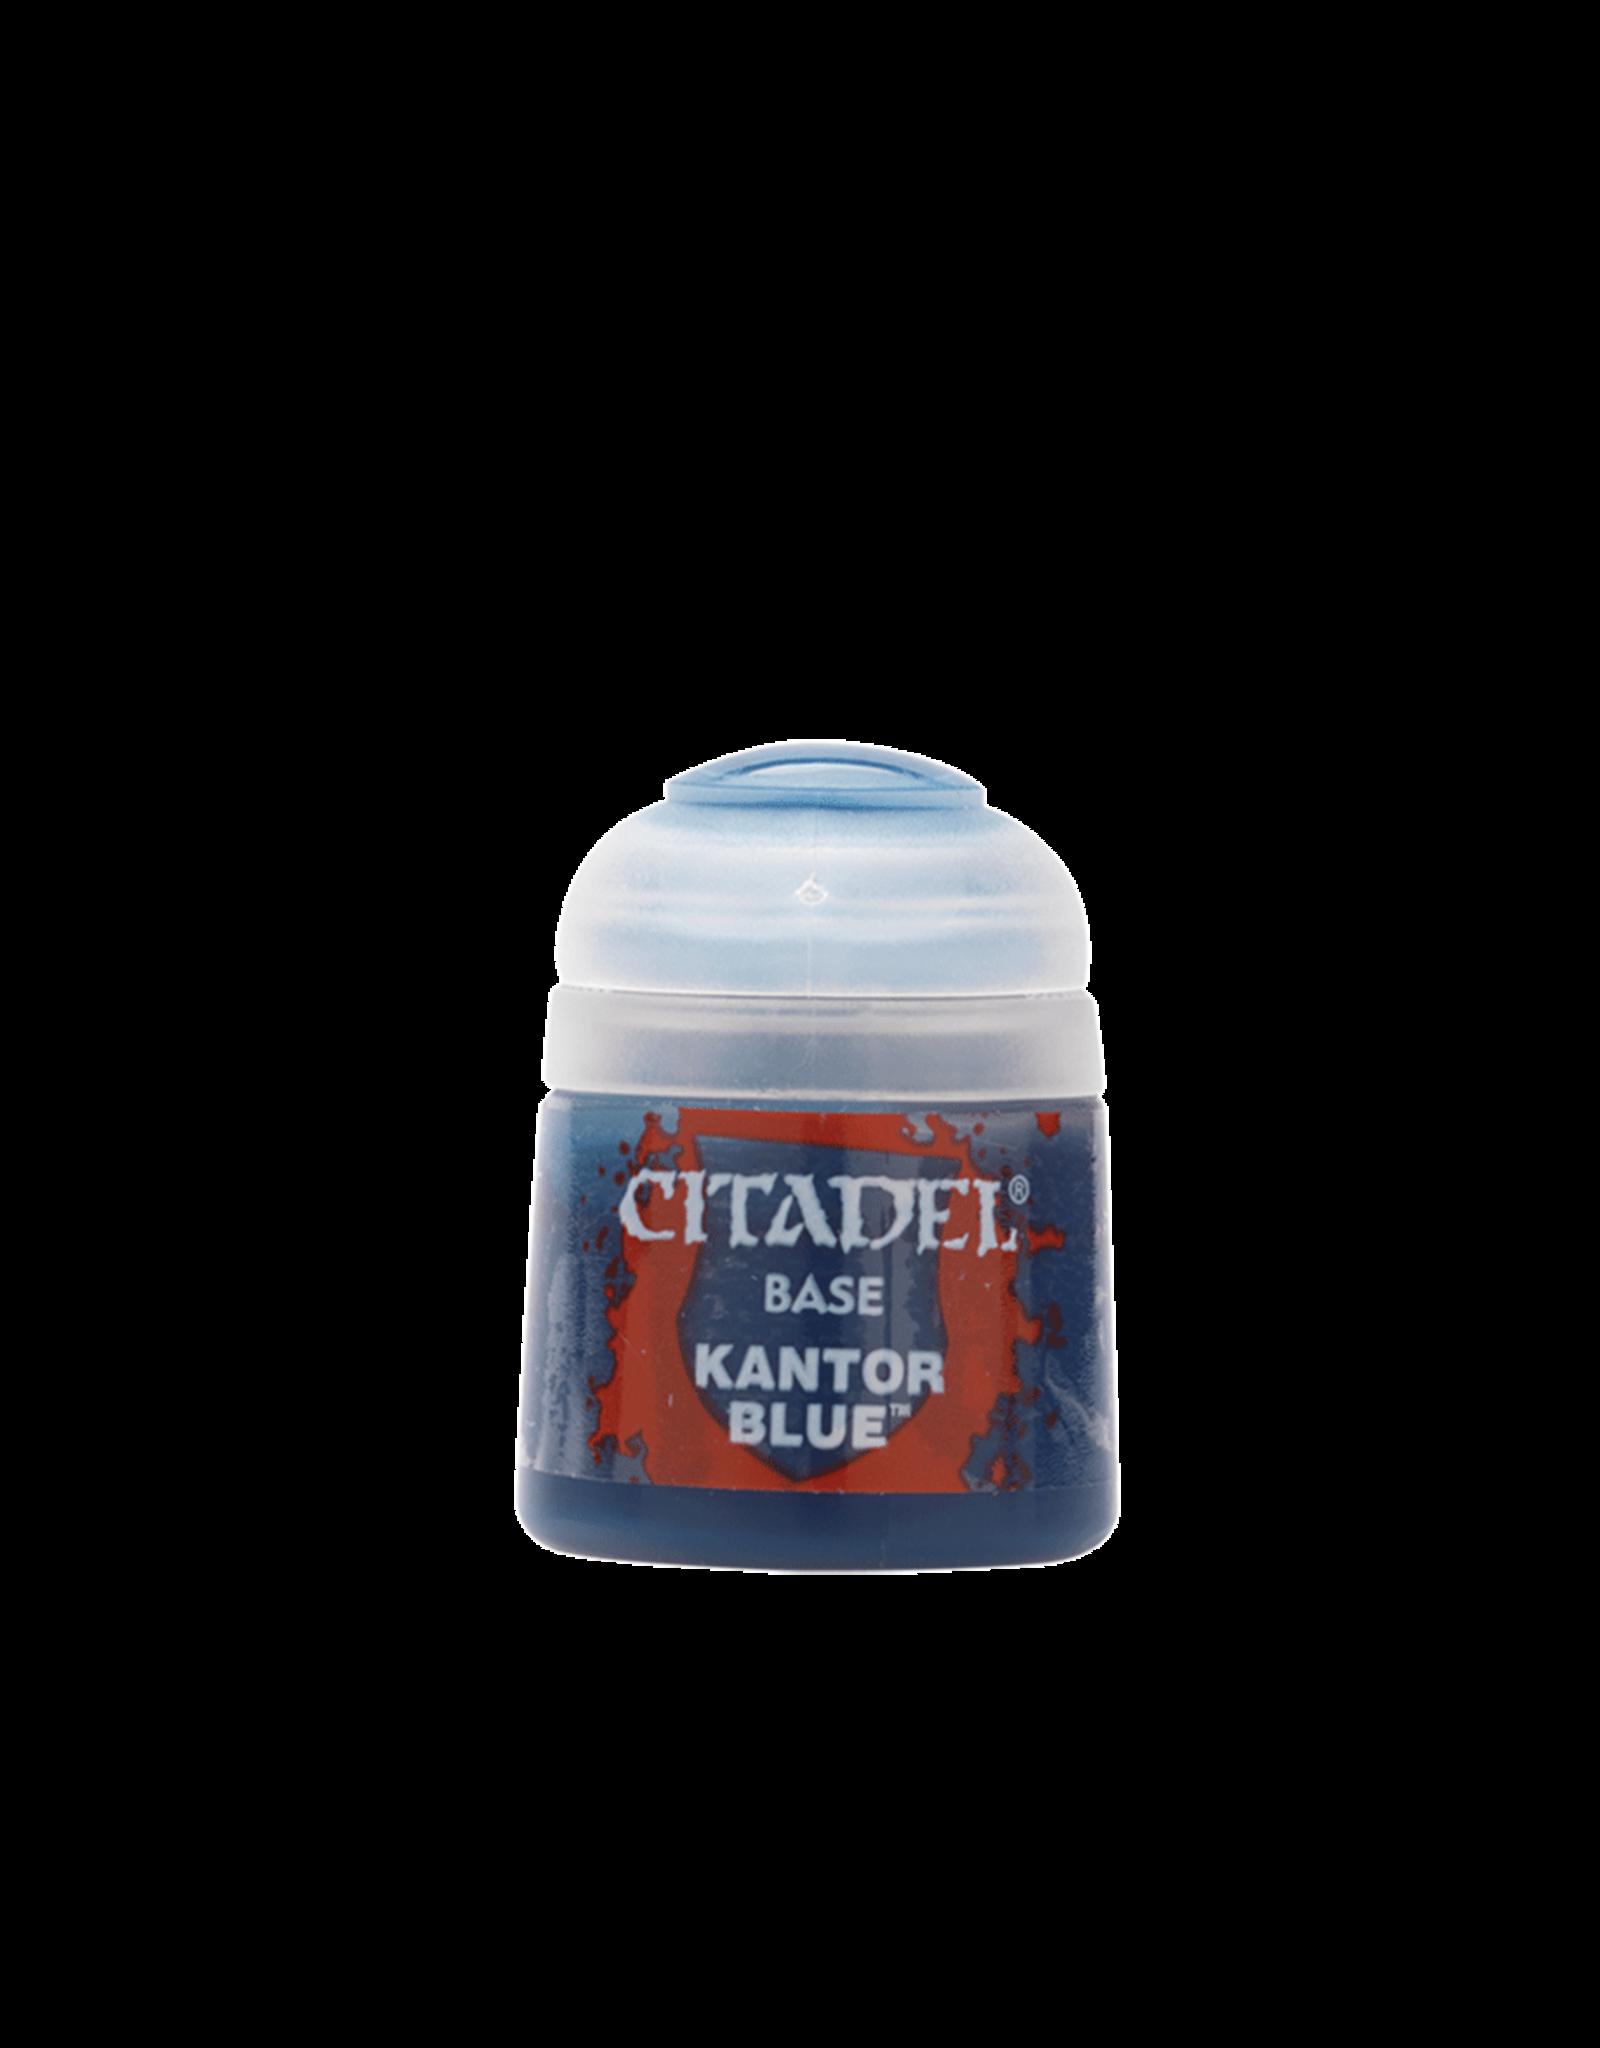 Citadel Kantor Blue